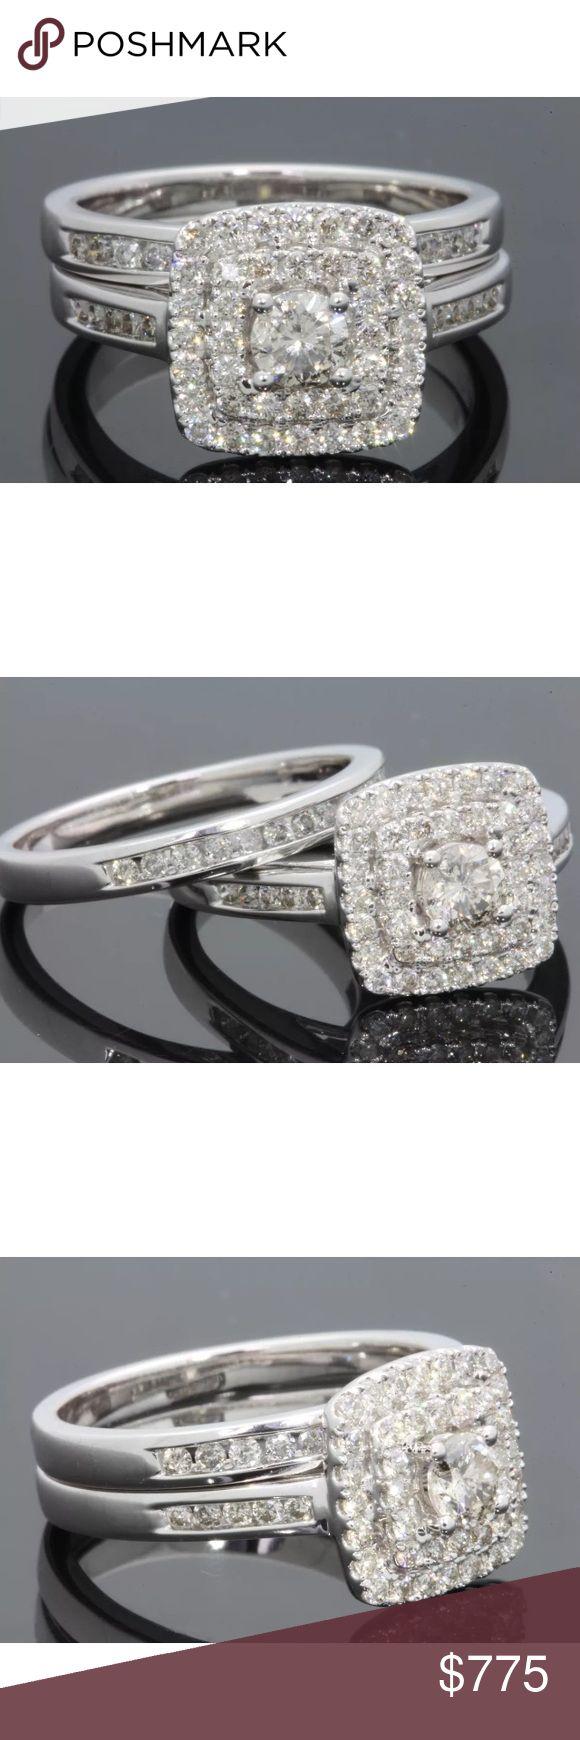 Beautiful 1.20 carat 14k diamond ring set Beautiful 1.20 carat 14k diamond ring set! Center diamond weighs 0.30 carats! Jewelry Rings